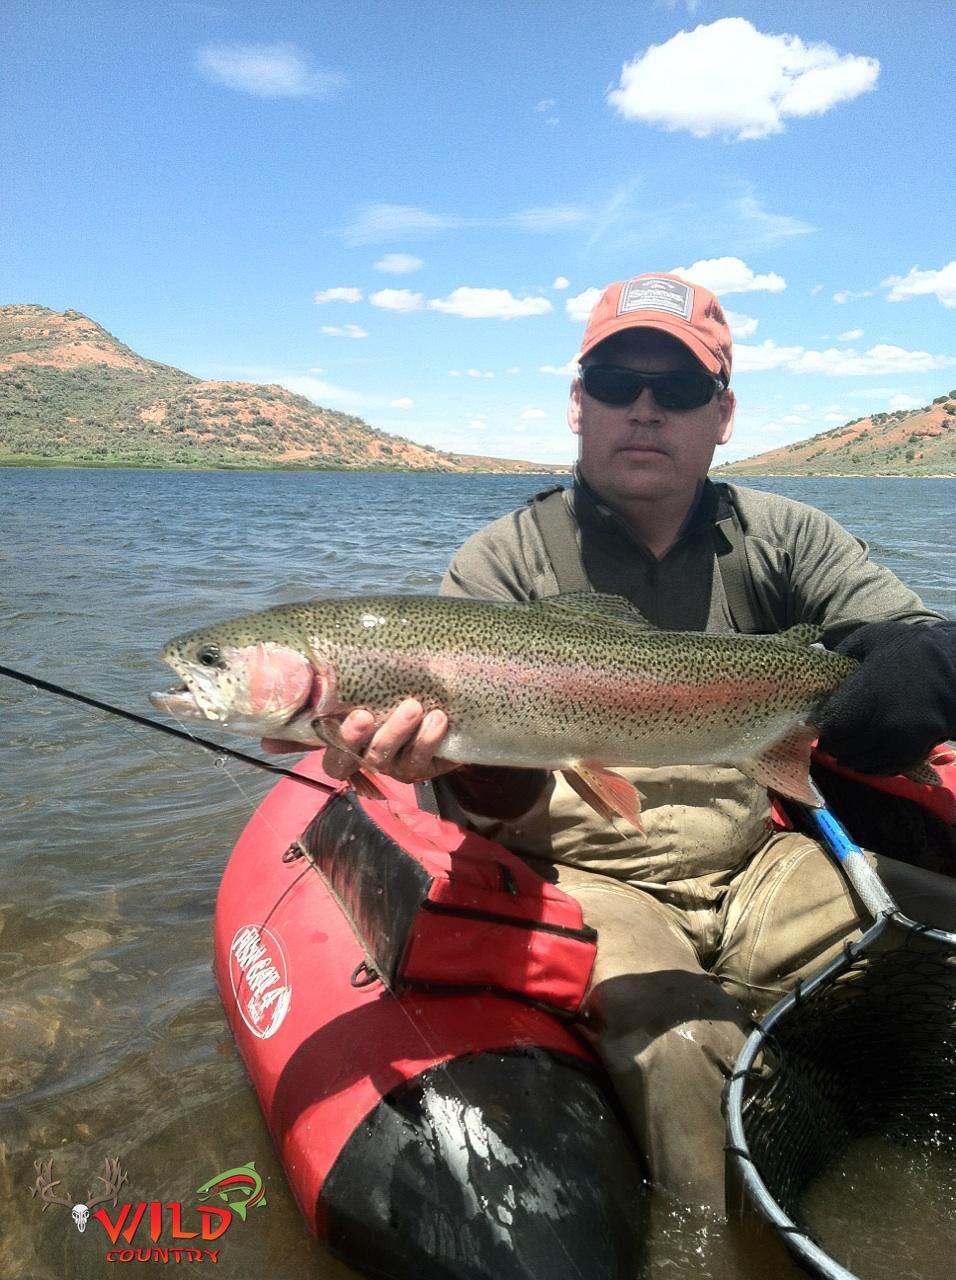 fly fishing utah rainbow trout - 46.jpg